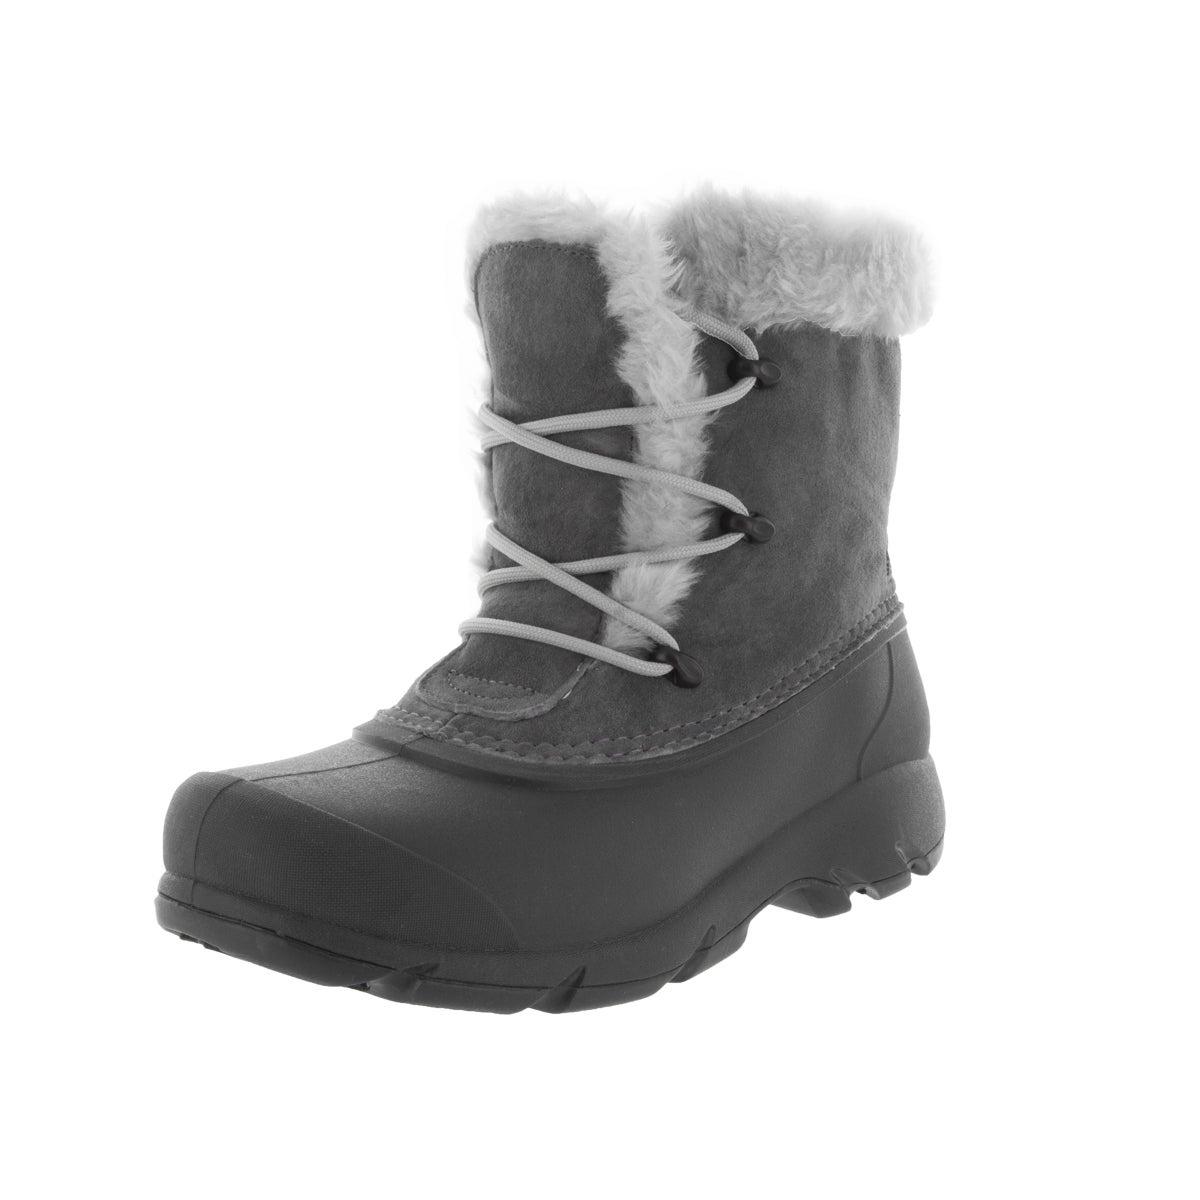 Sorel Women's Snow Angel Grey Suede Lace Boot